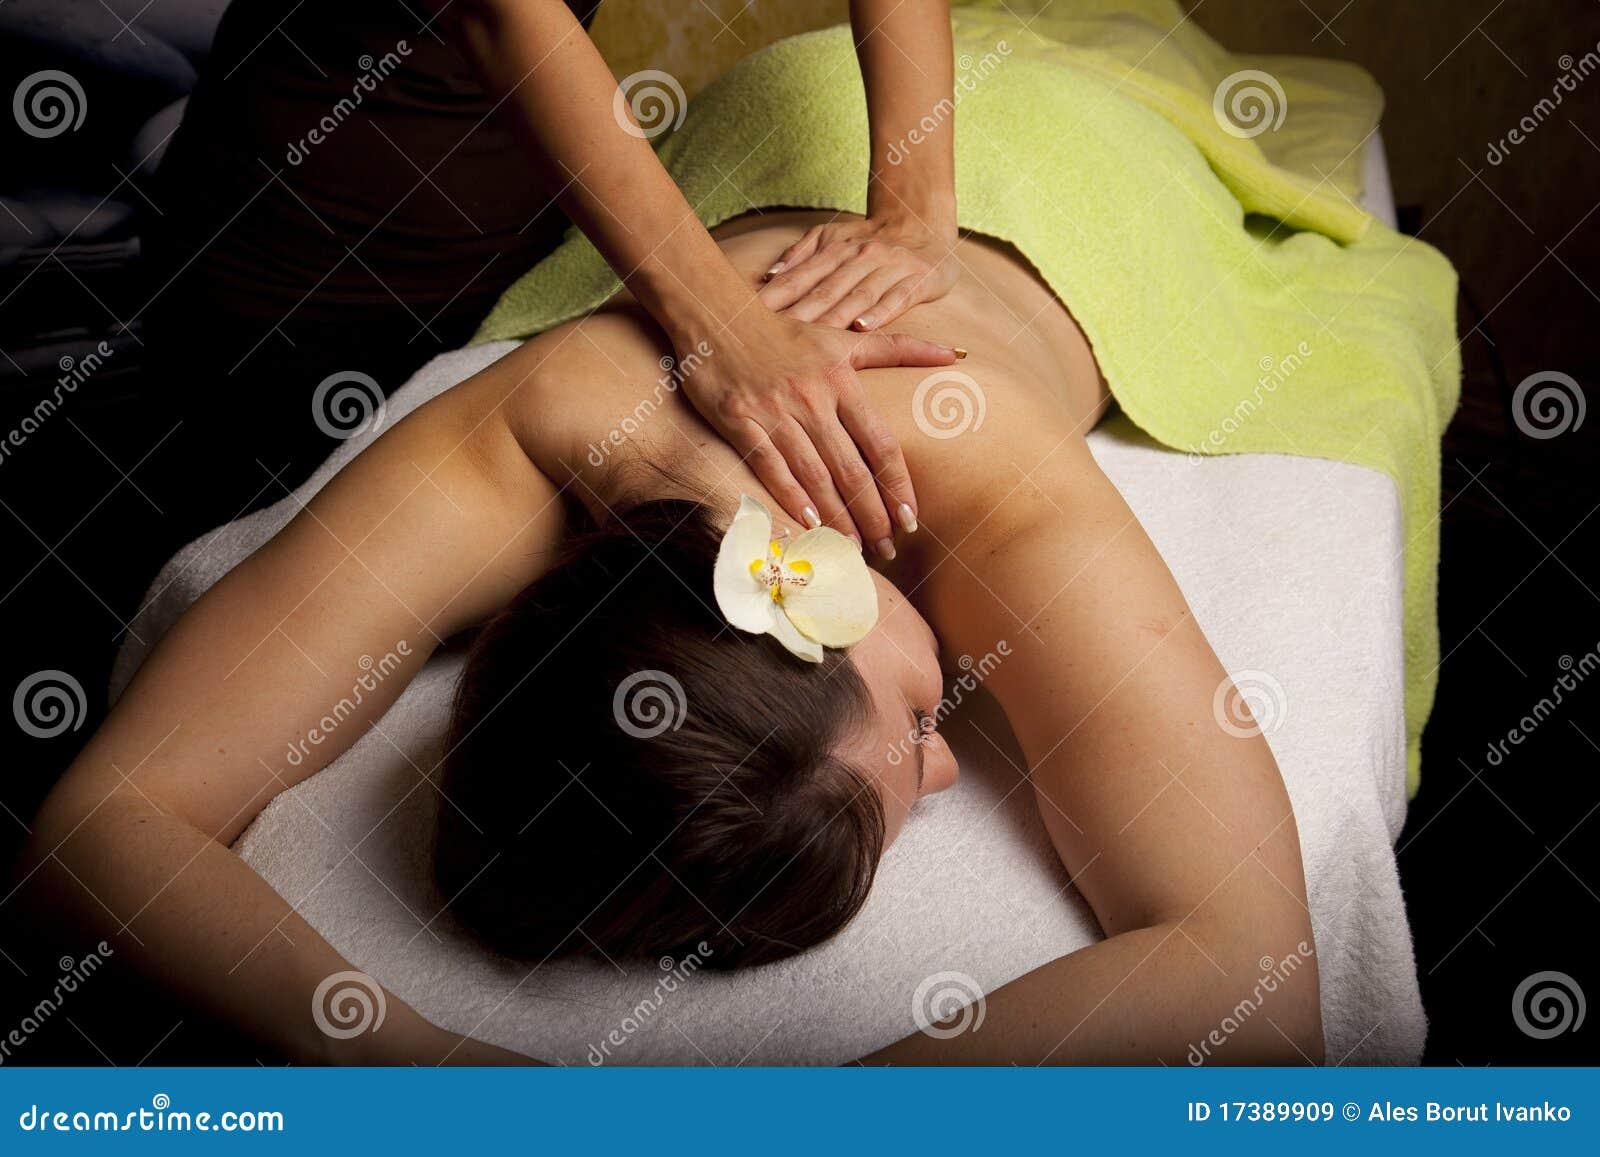 Massage in a SPA center